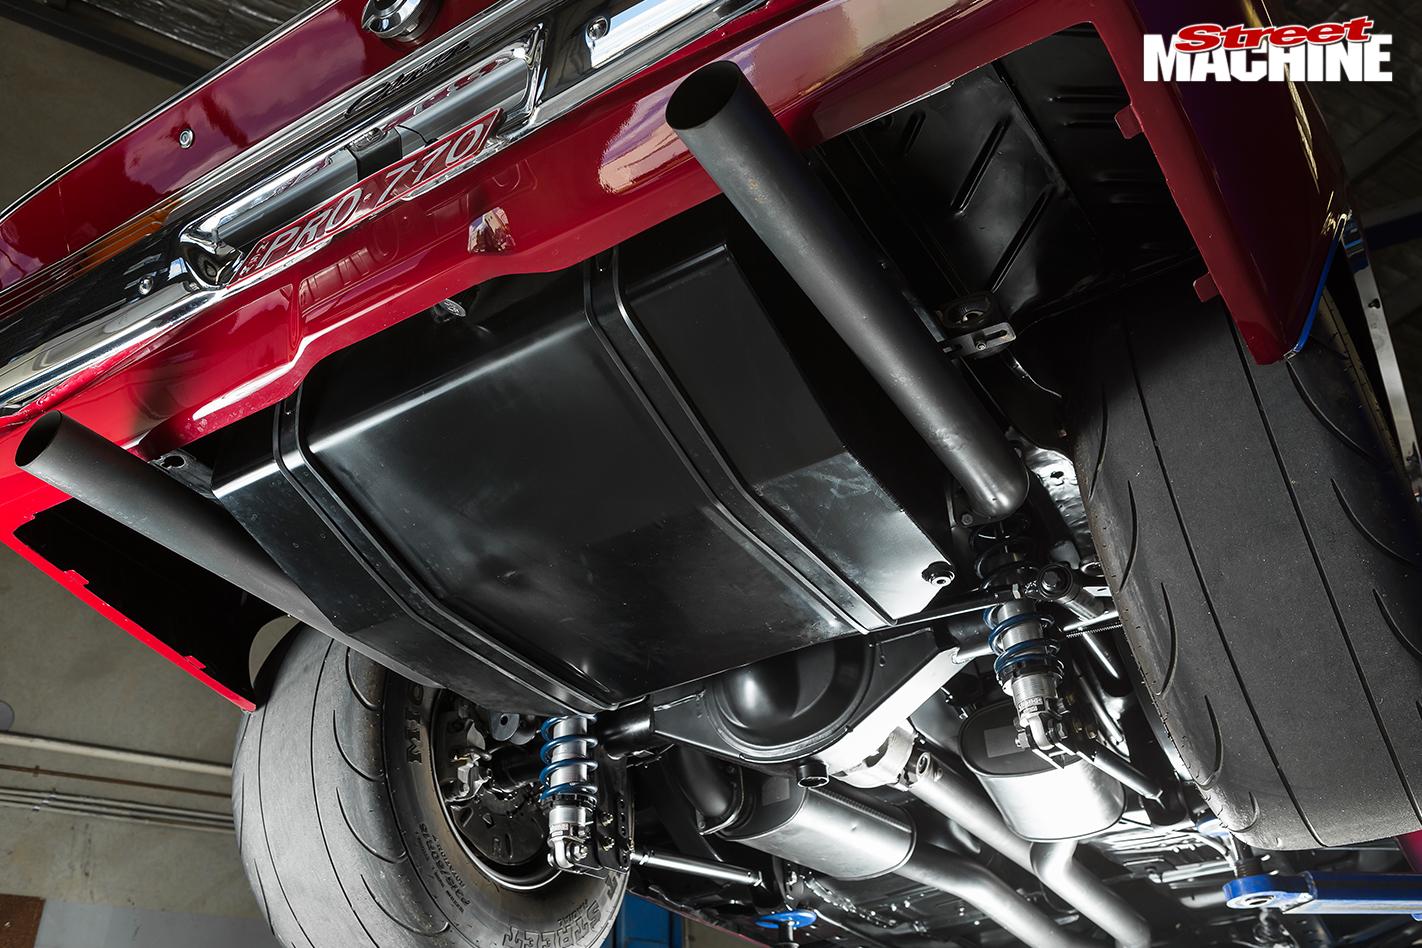 Chrysler -cl -charger -under